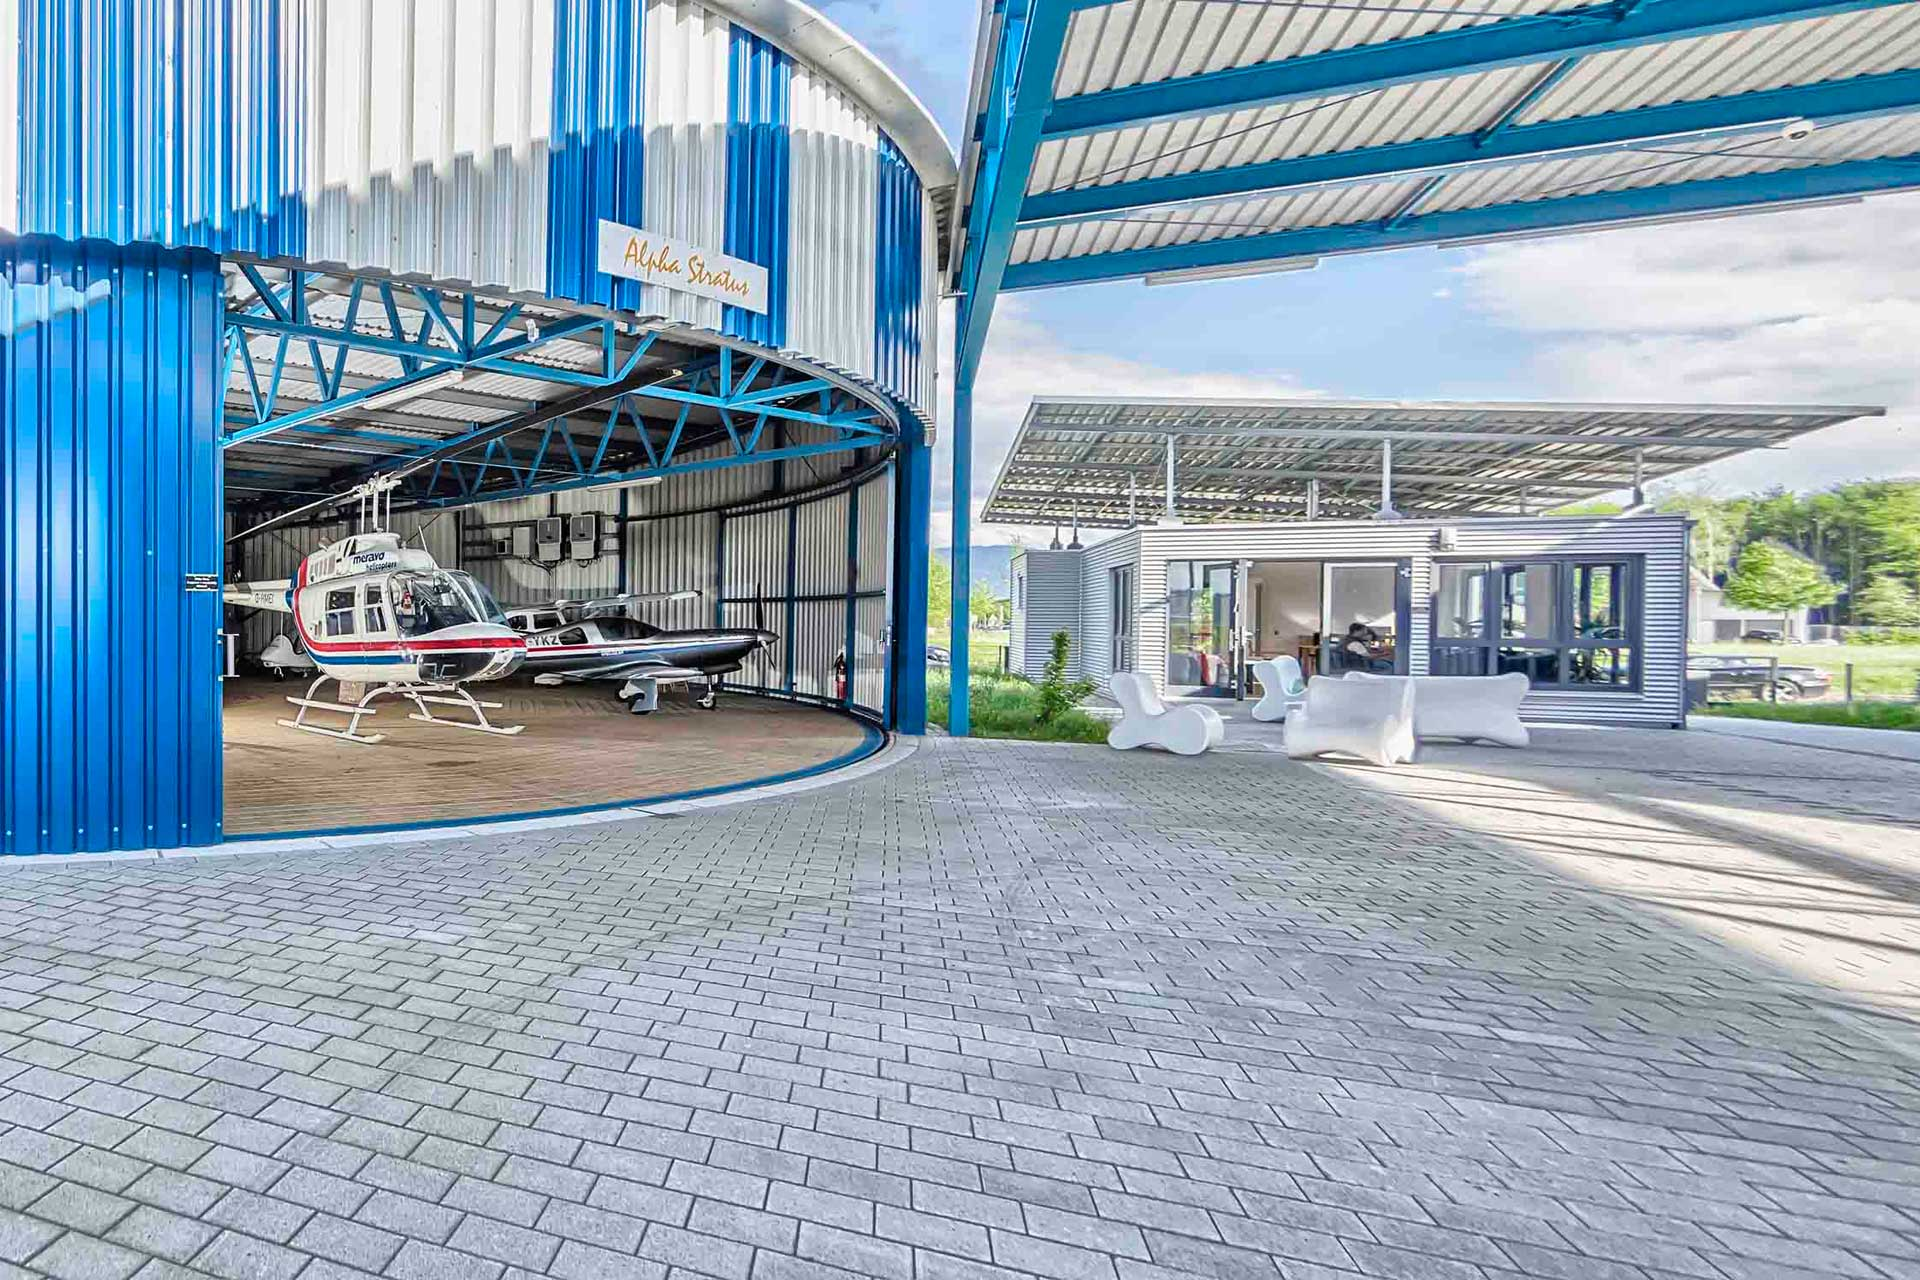 Heli-Breisgau im Hangar Breisgauring